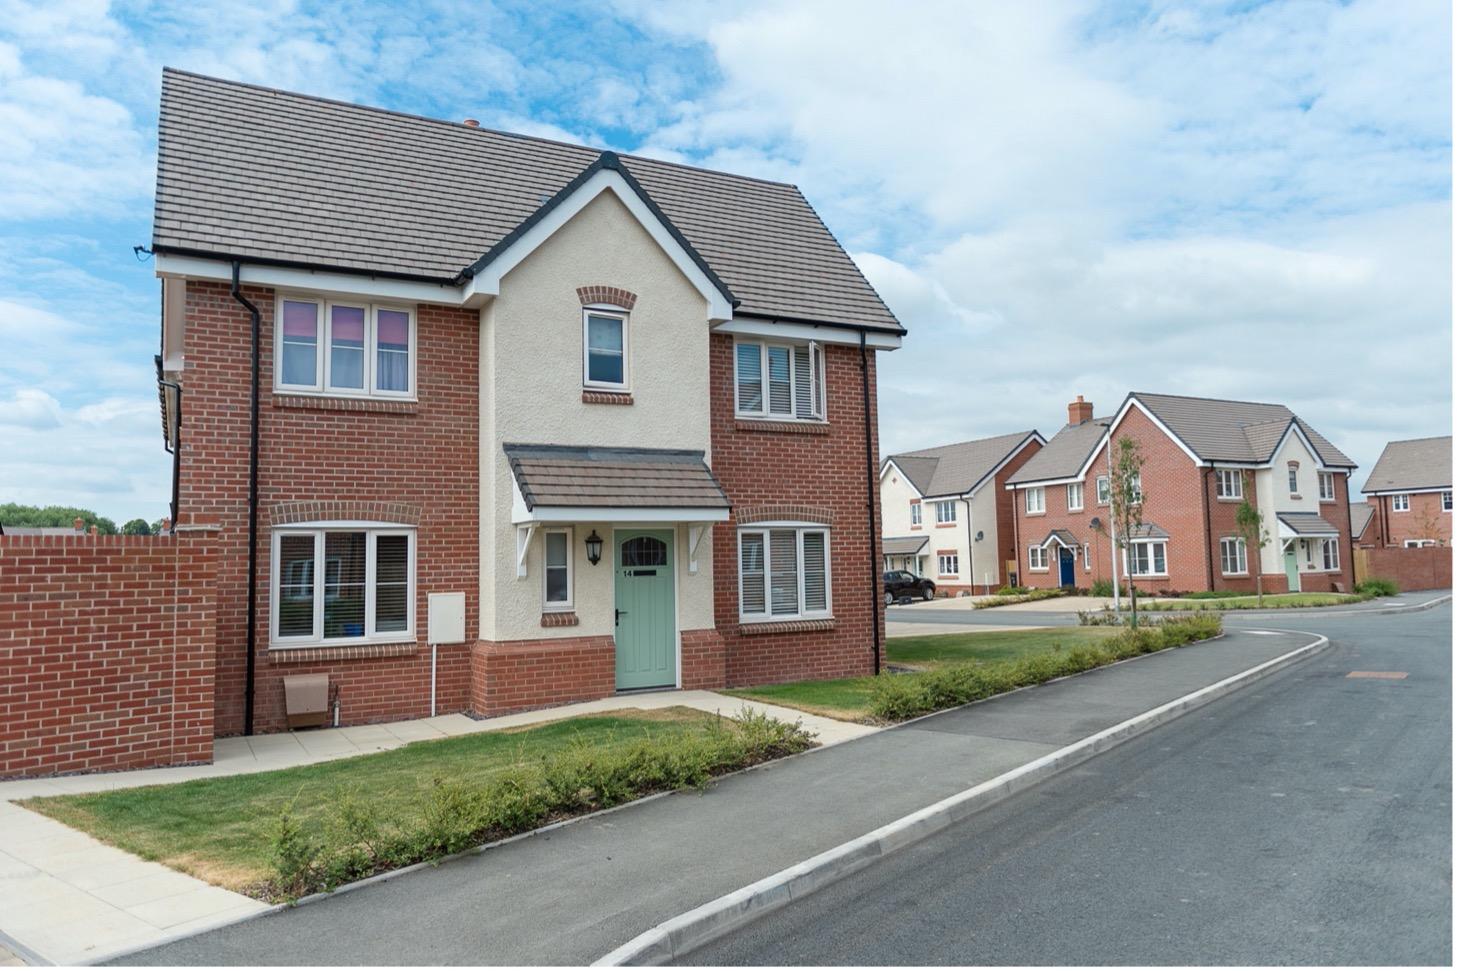 SJ Roberts Reveals Their Shrewsbury Development Is Now Complete